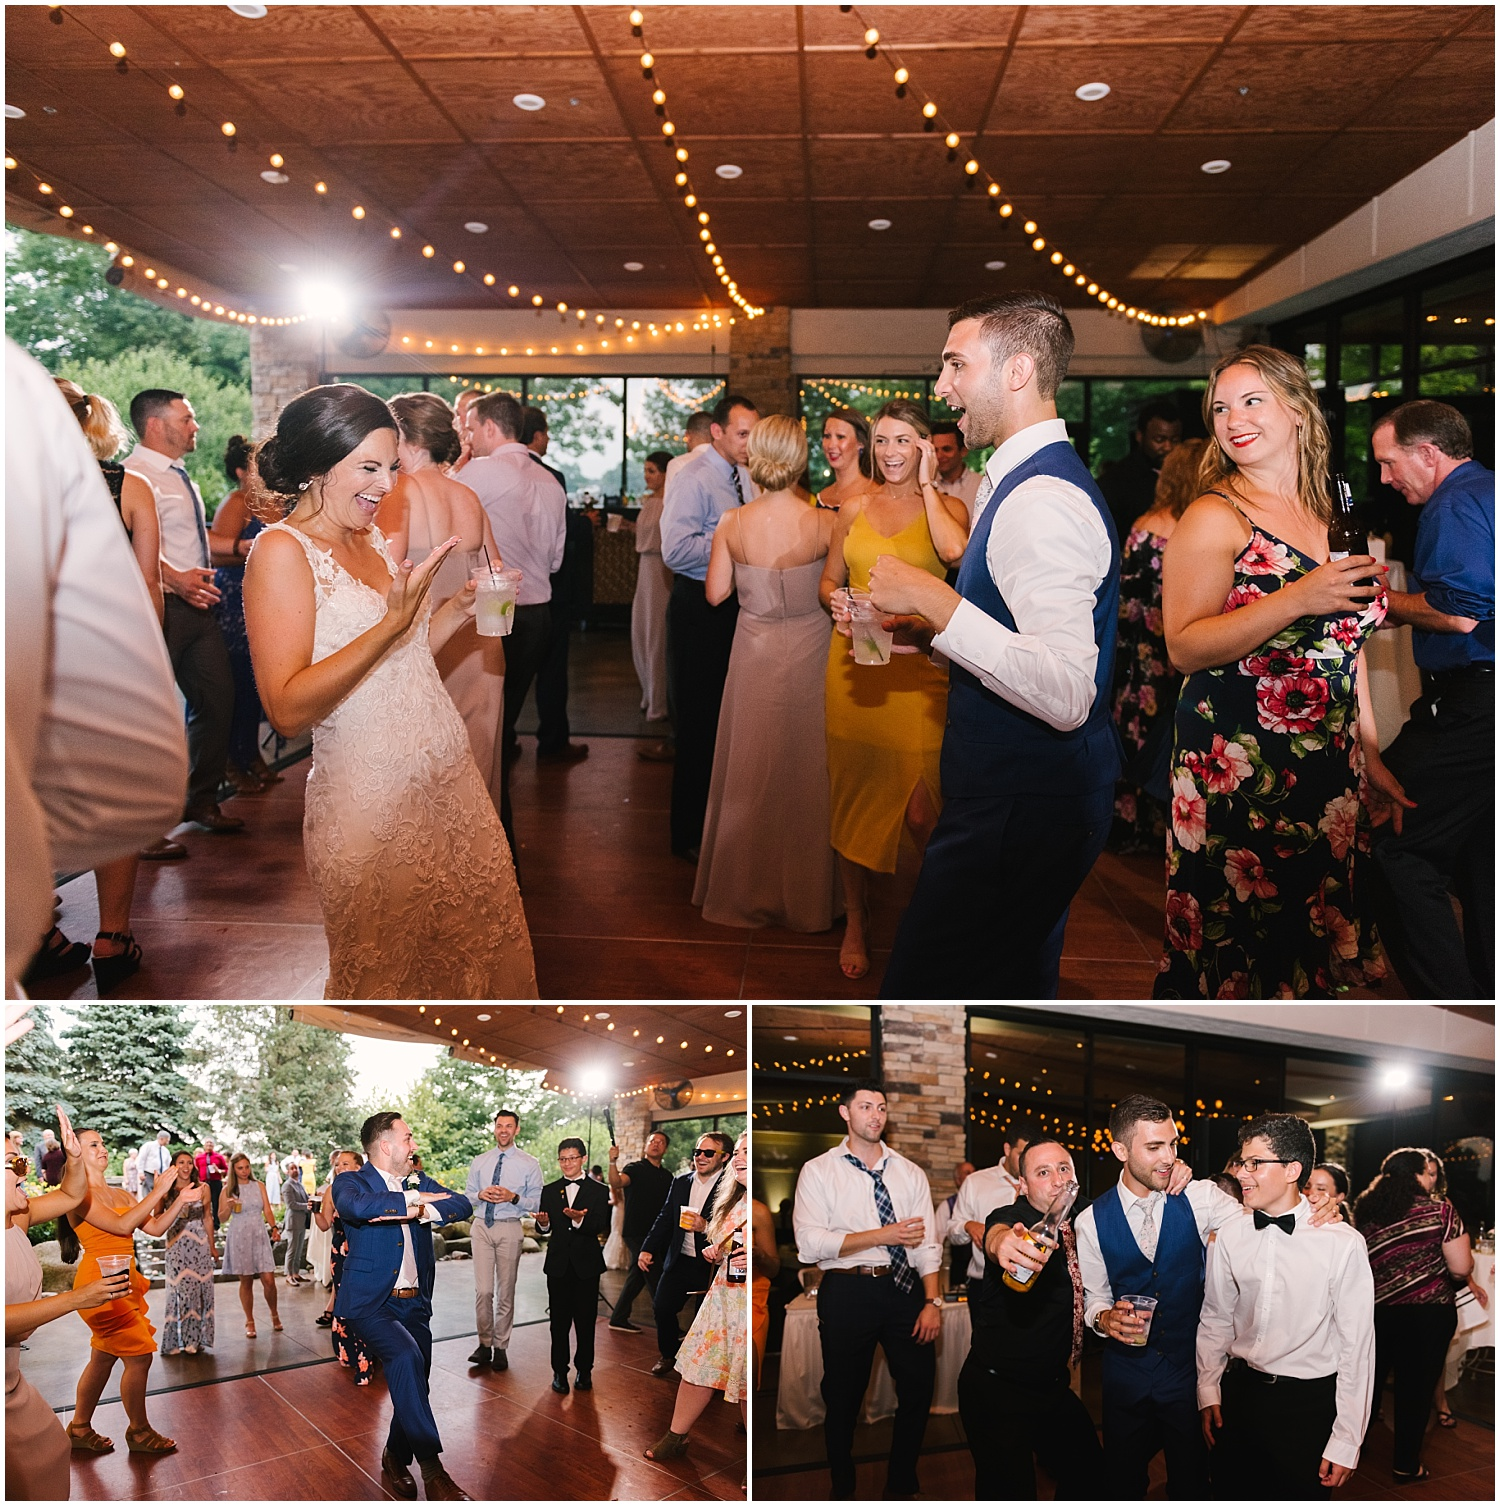 ravenwood+golf+course+wedding+rochester+wedding (58).jpg